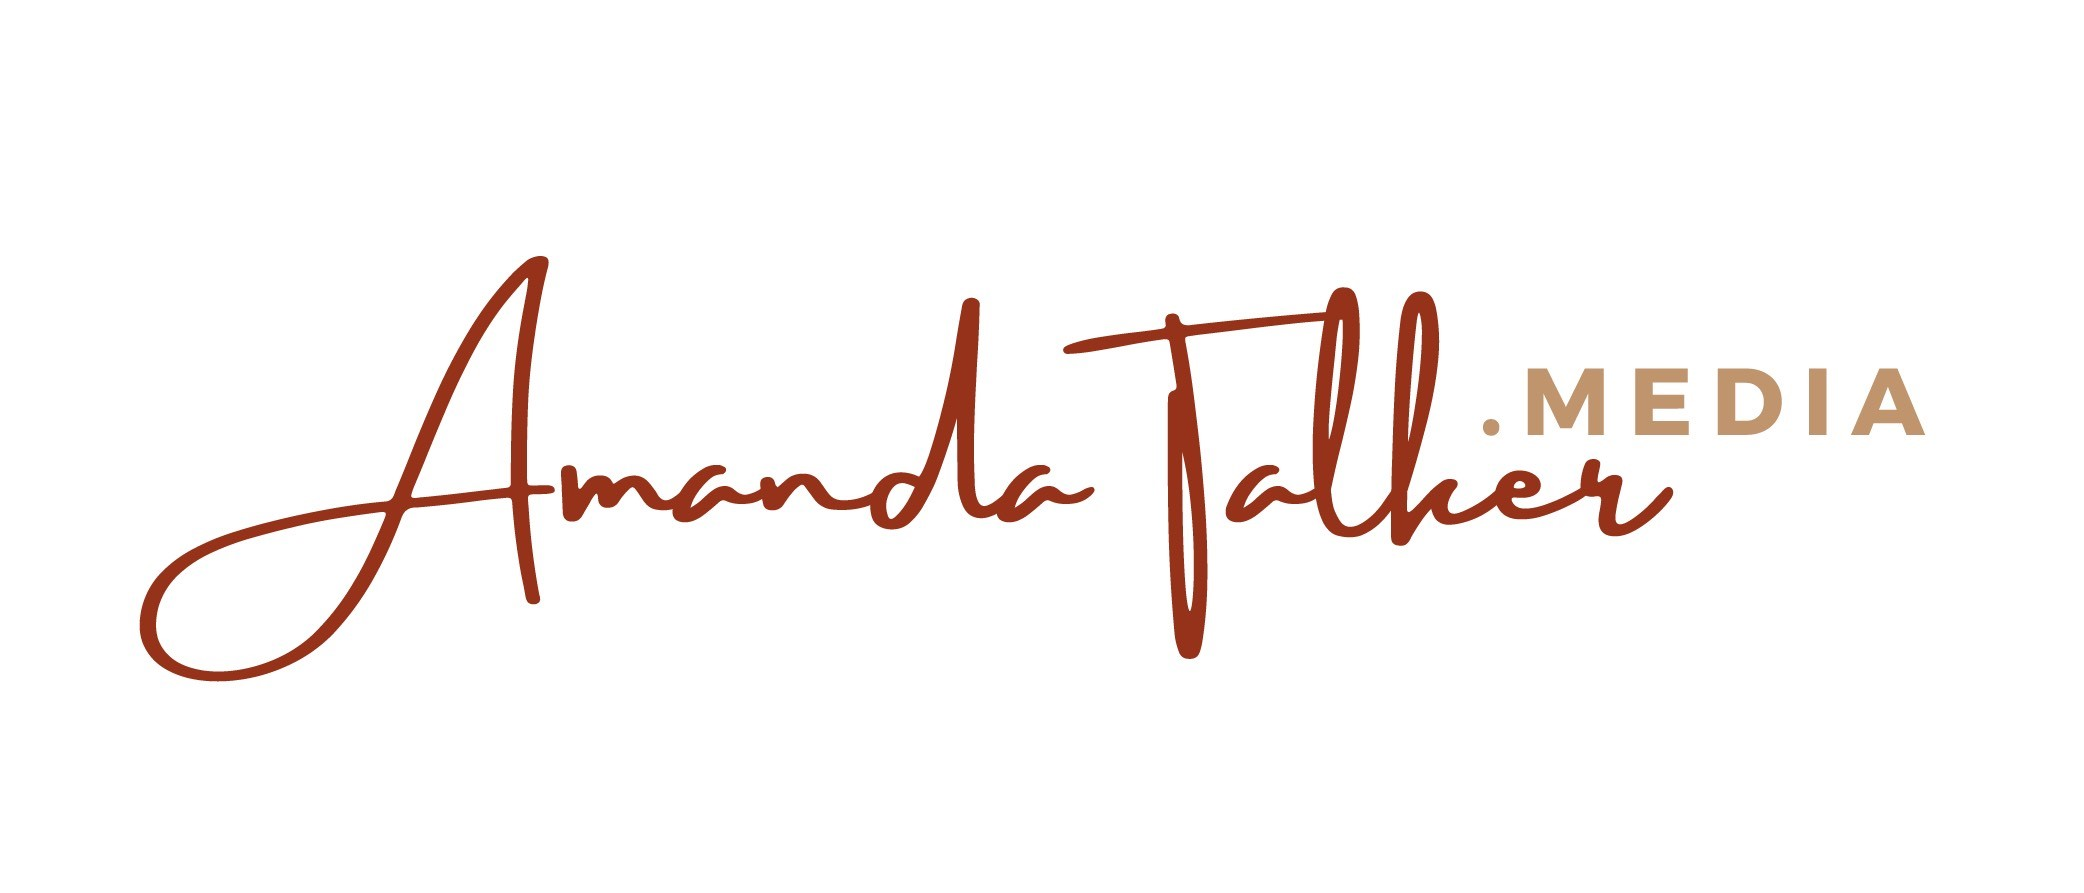 Amanda Talker Media